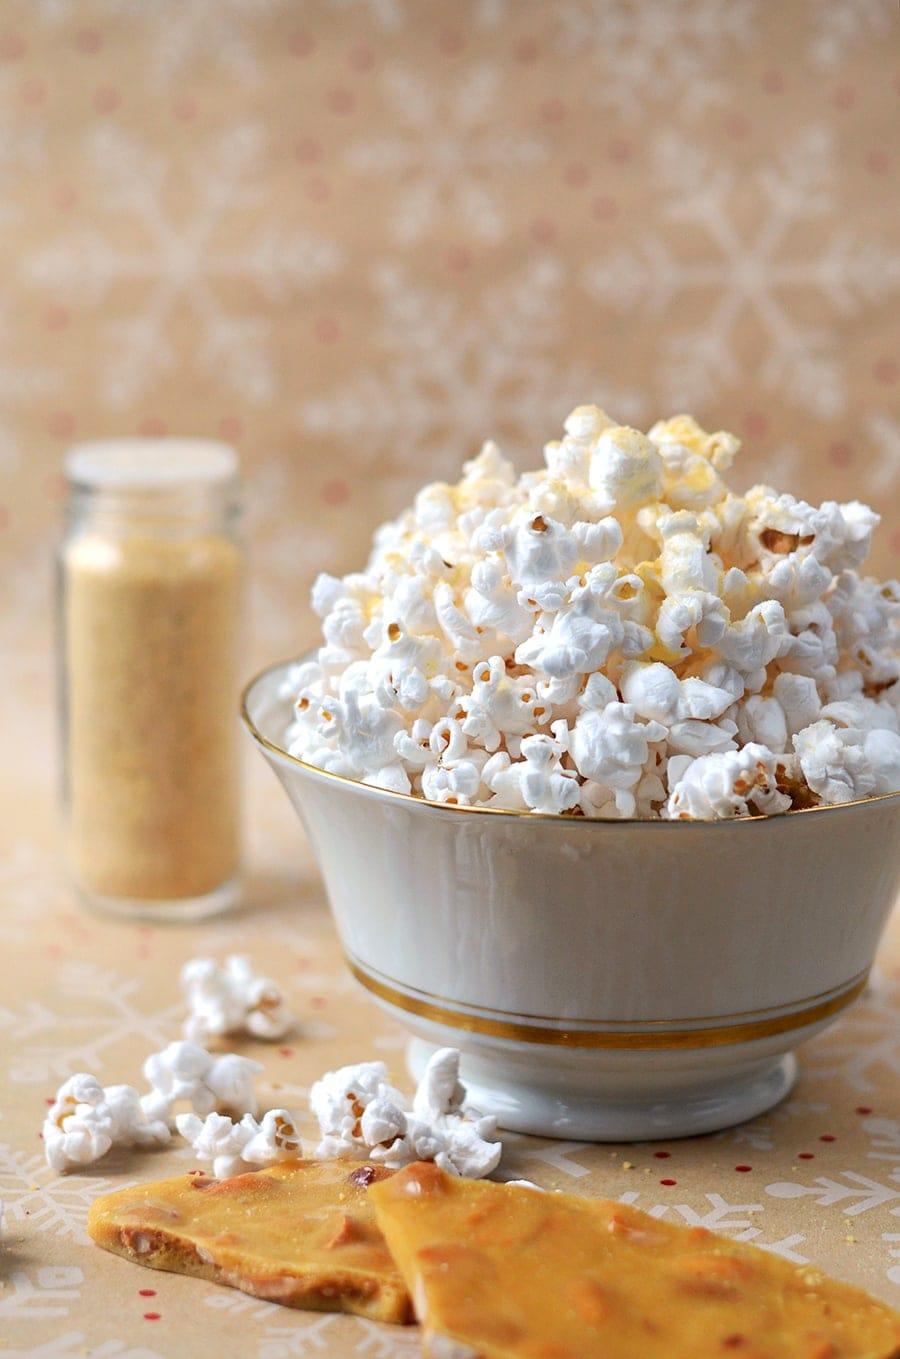 Peanut Brittle Popcorn Topping Vertical Web - Peanut Brittle Popcorn Topping